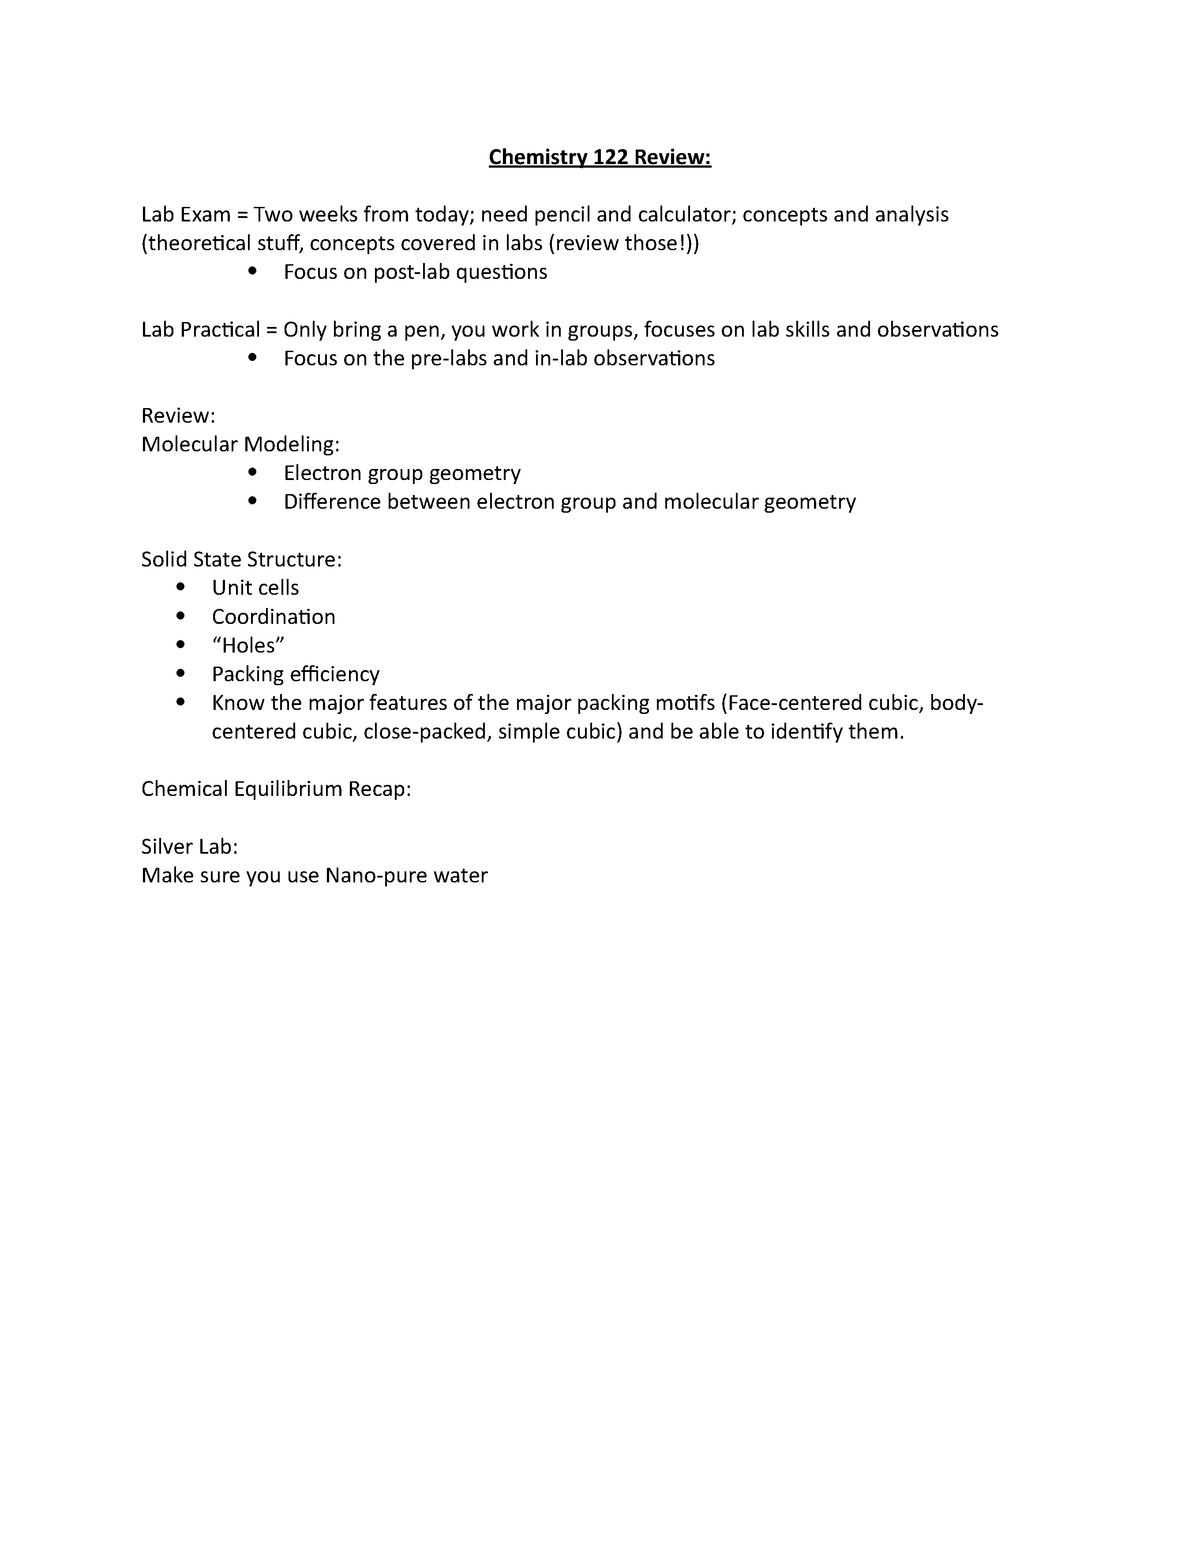 Chemistry 122 Review - General Inorganic Chemistry Lab